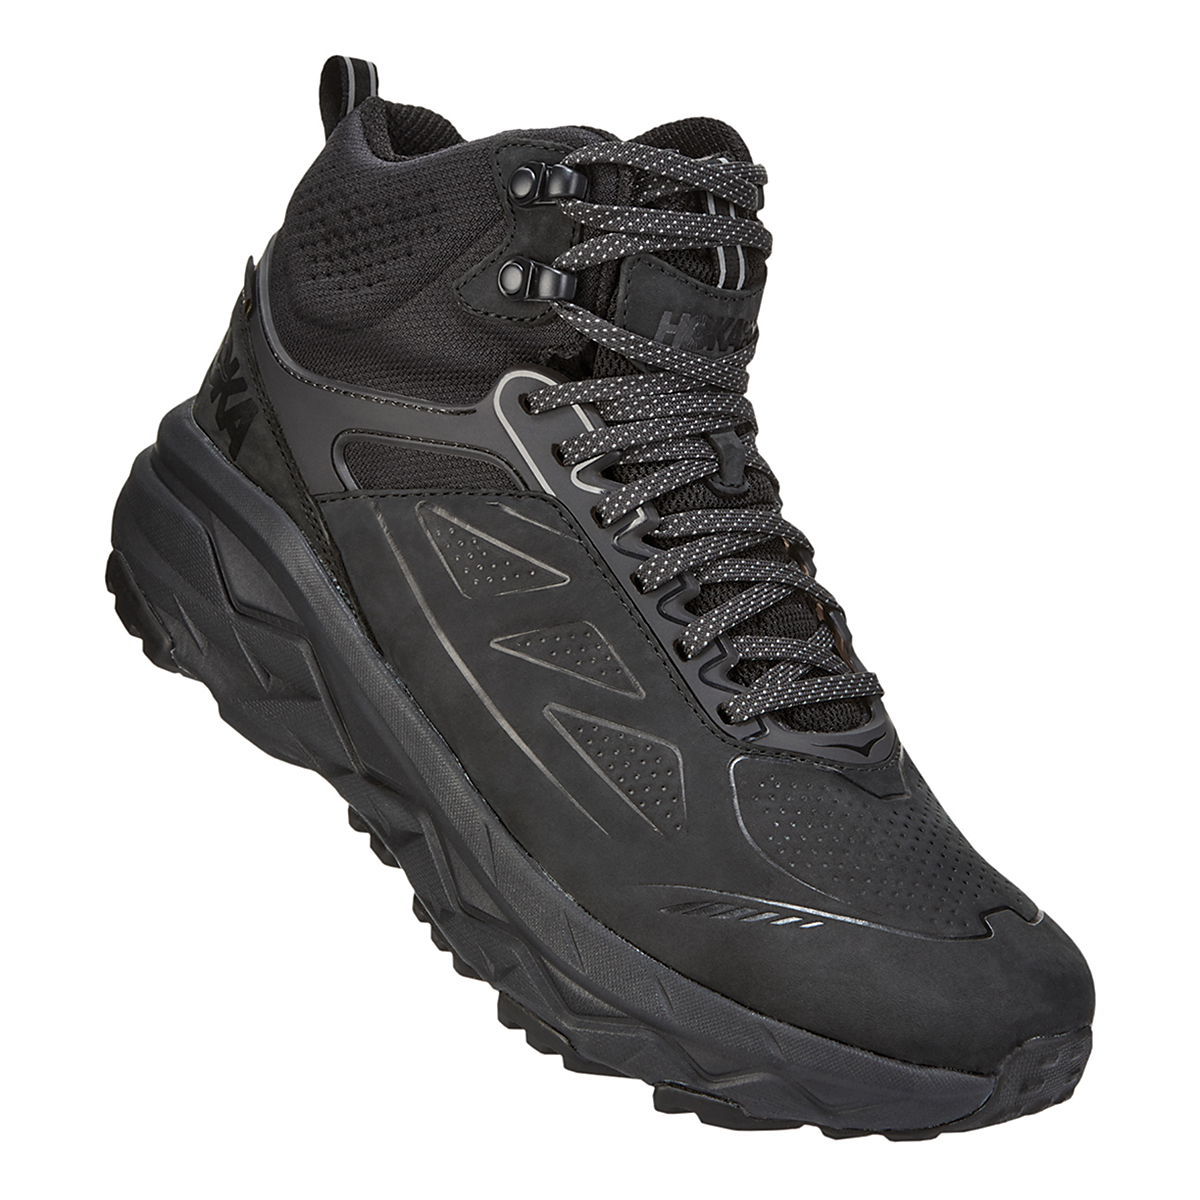 Men's Hoka One One Challenger Mid Gore-Tex Trail Running Shoe - Color: Black (Regular Width) - Size: 11, Black, large, image 2